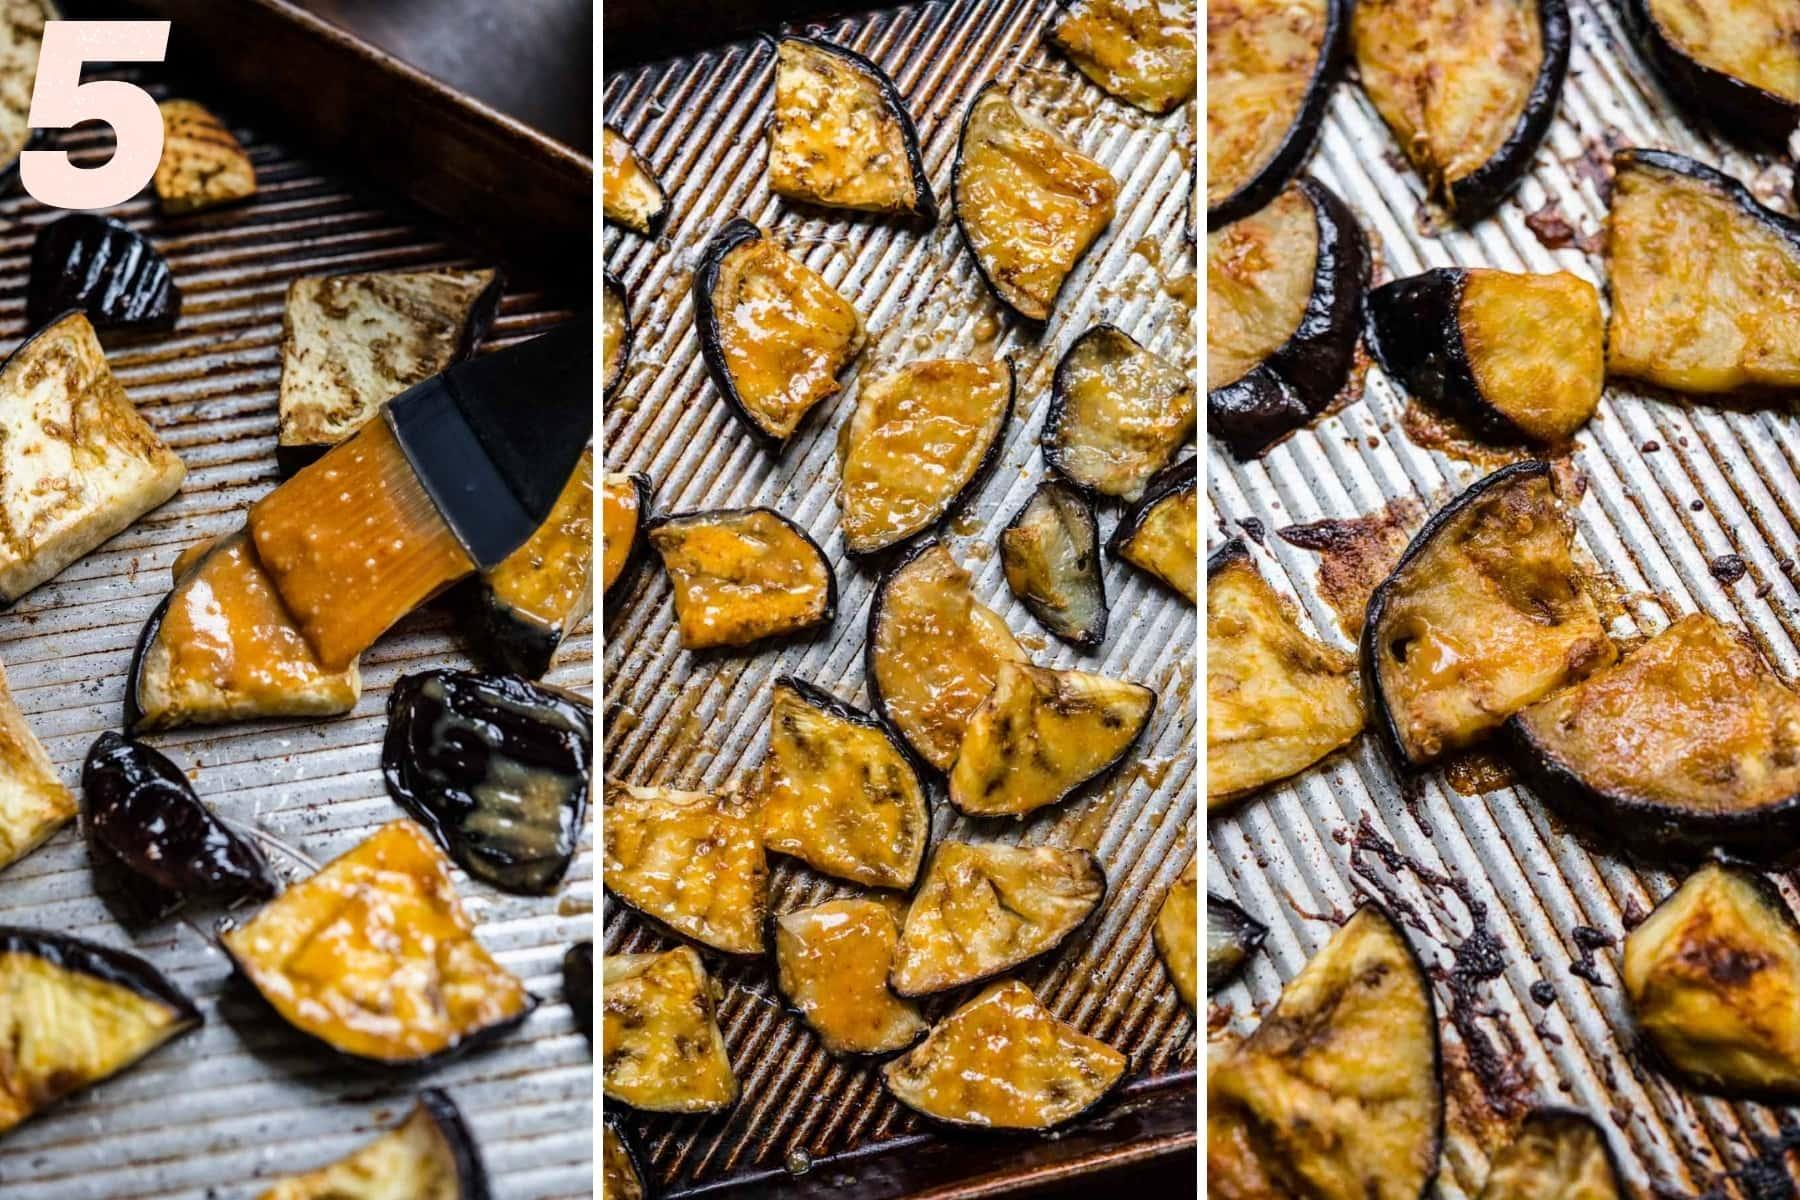 brushing eggplant slices with miso glaze and baking on sheet pan.